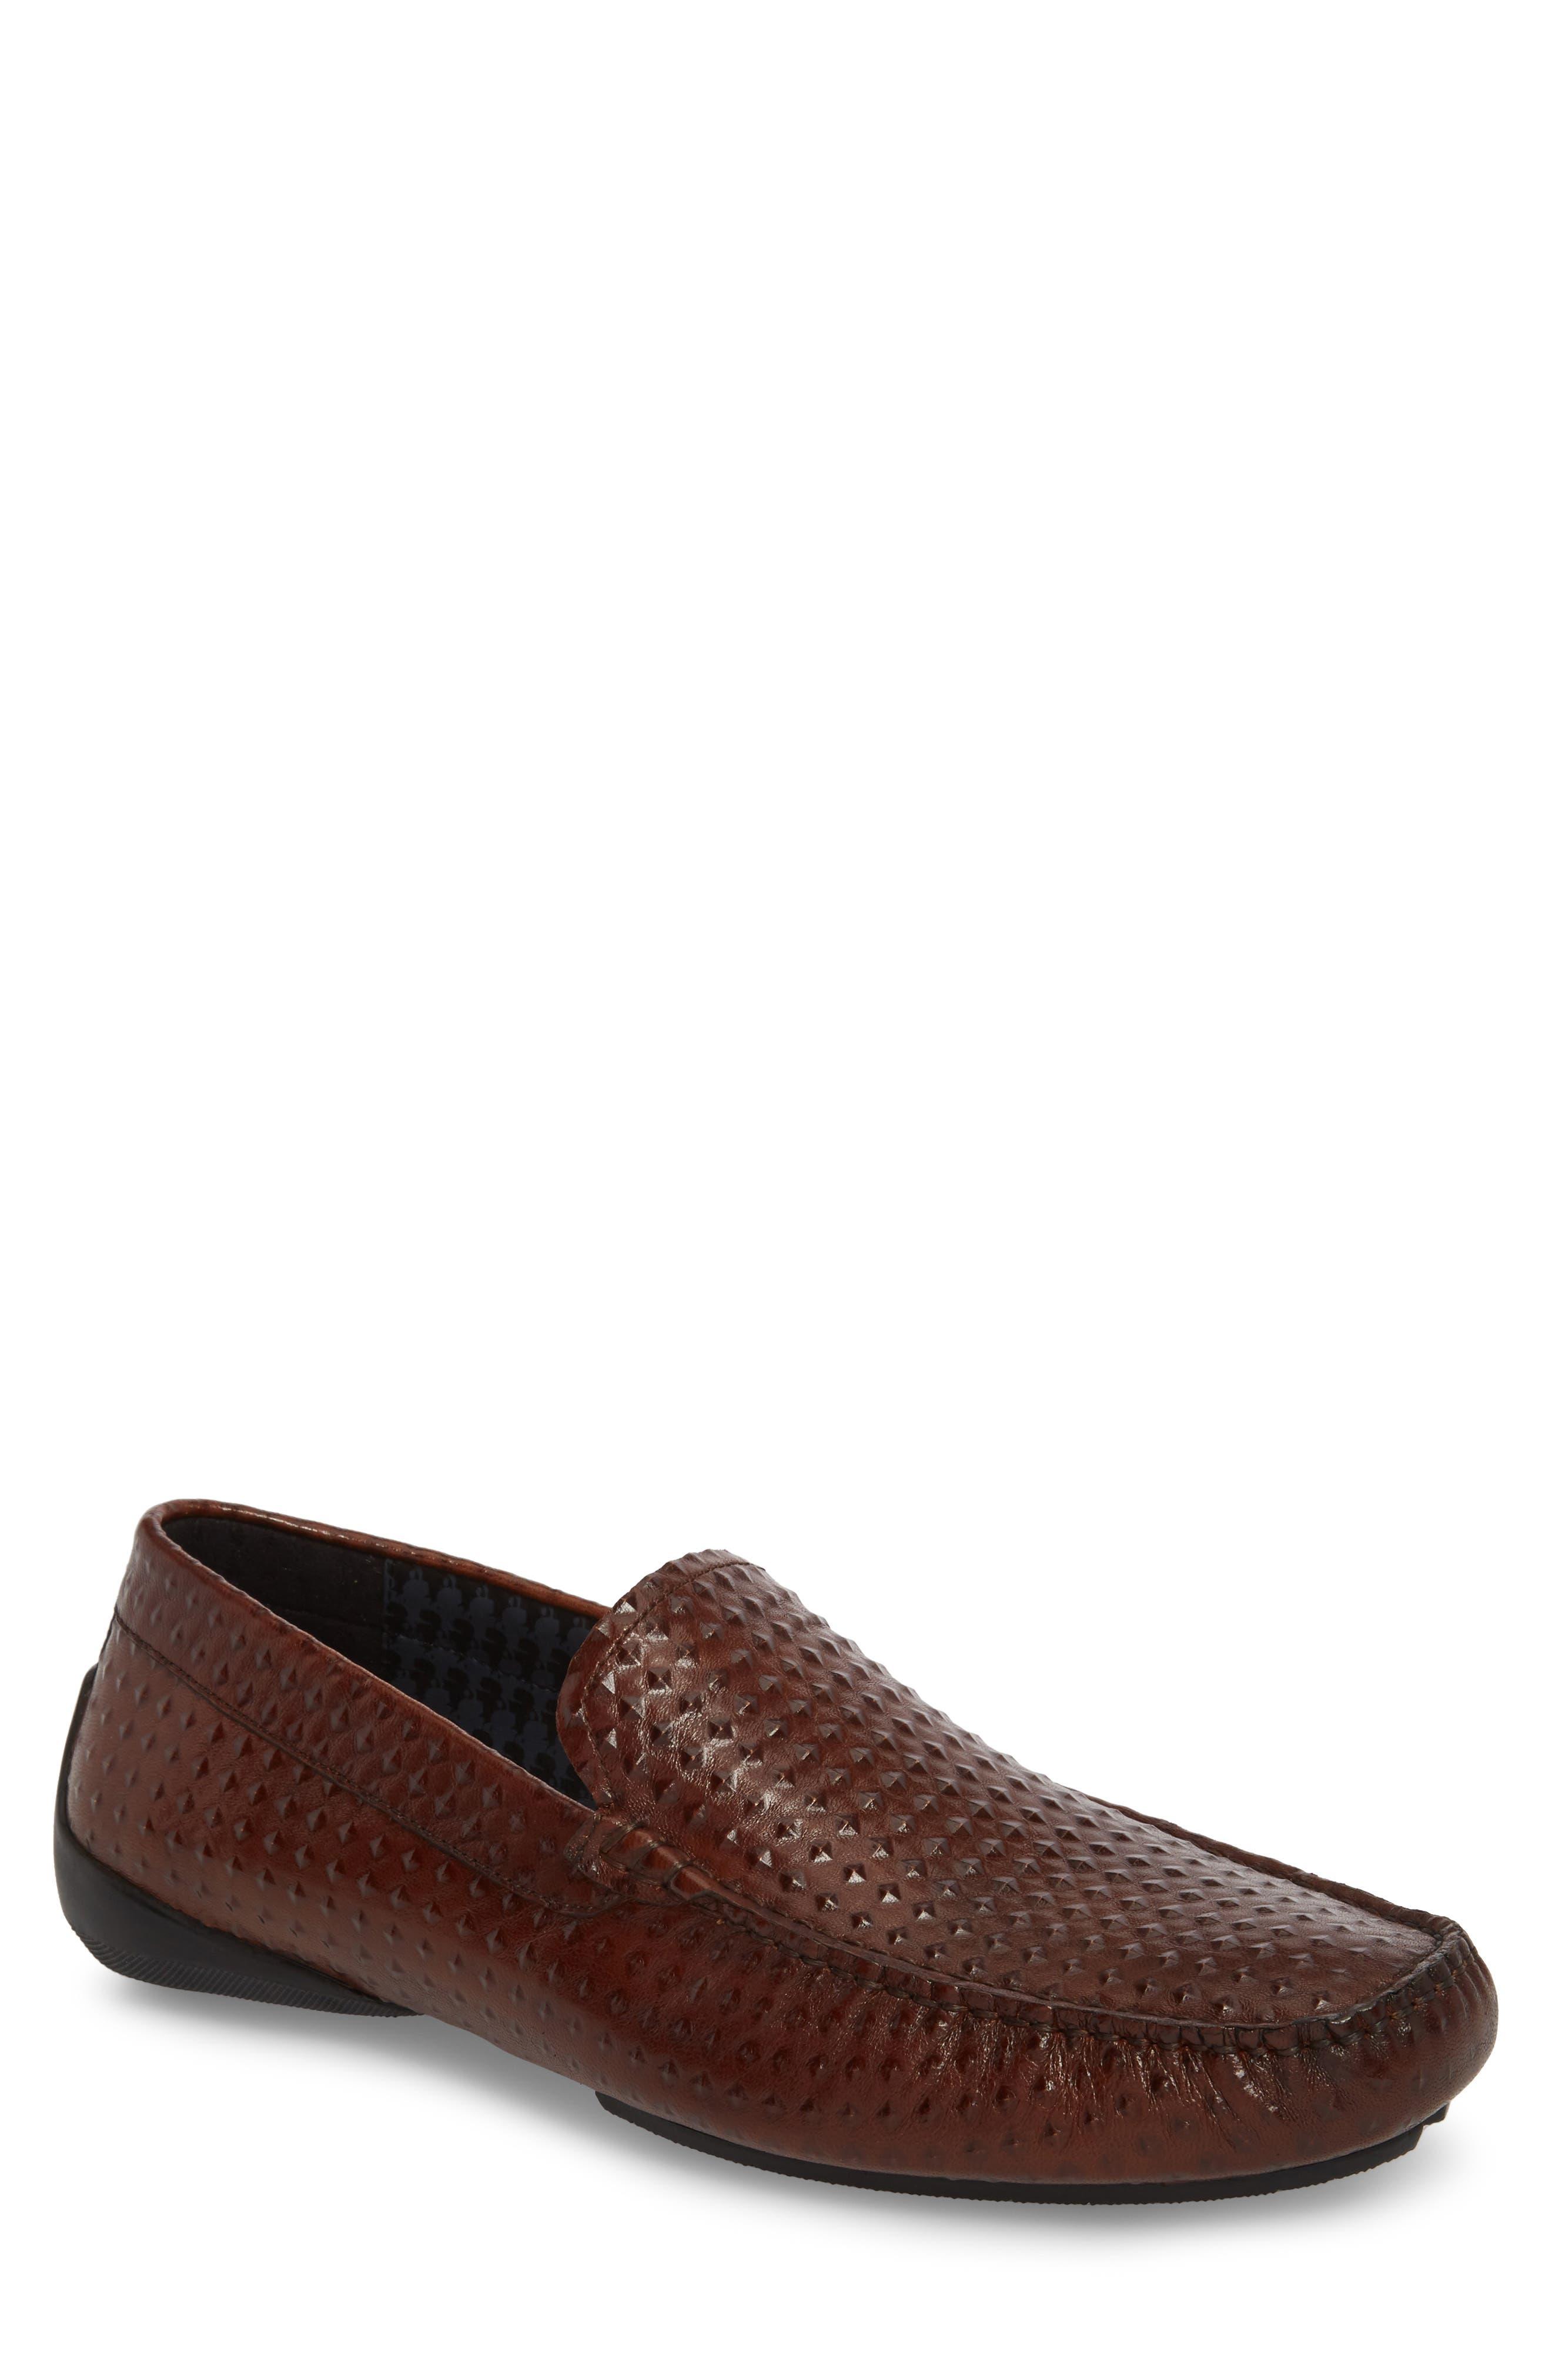 Karl Lagerfeld Paris Driving Shoe (Men)